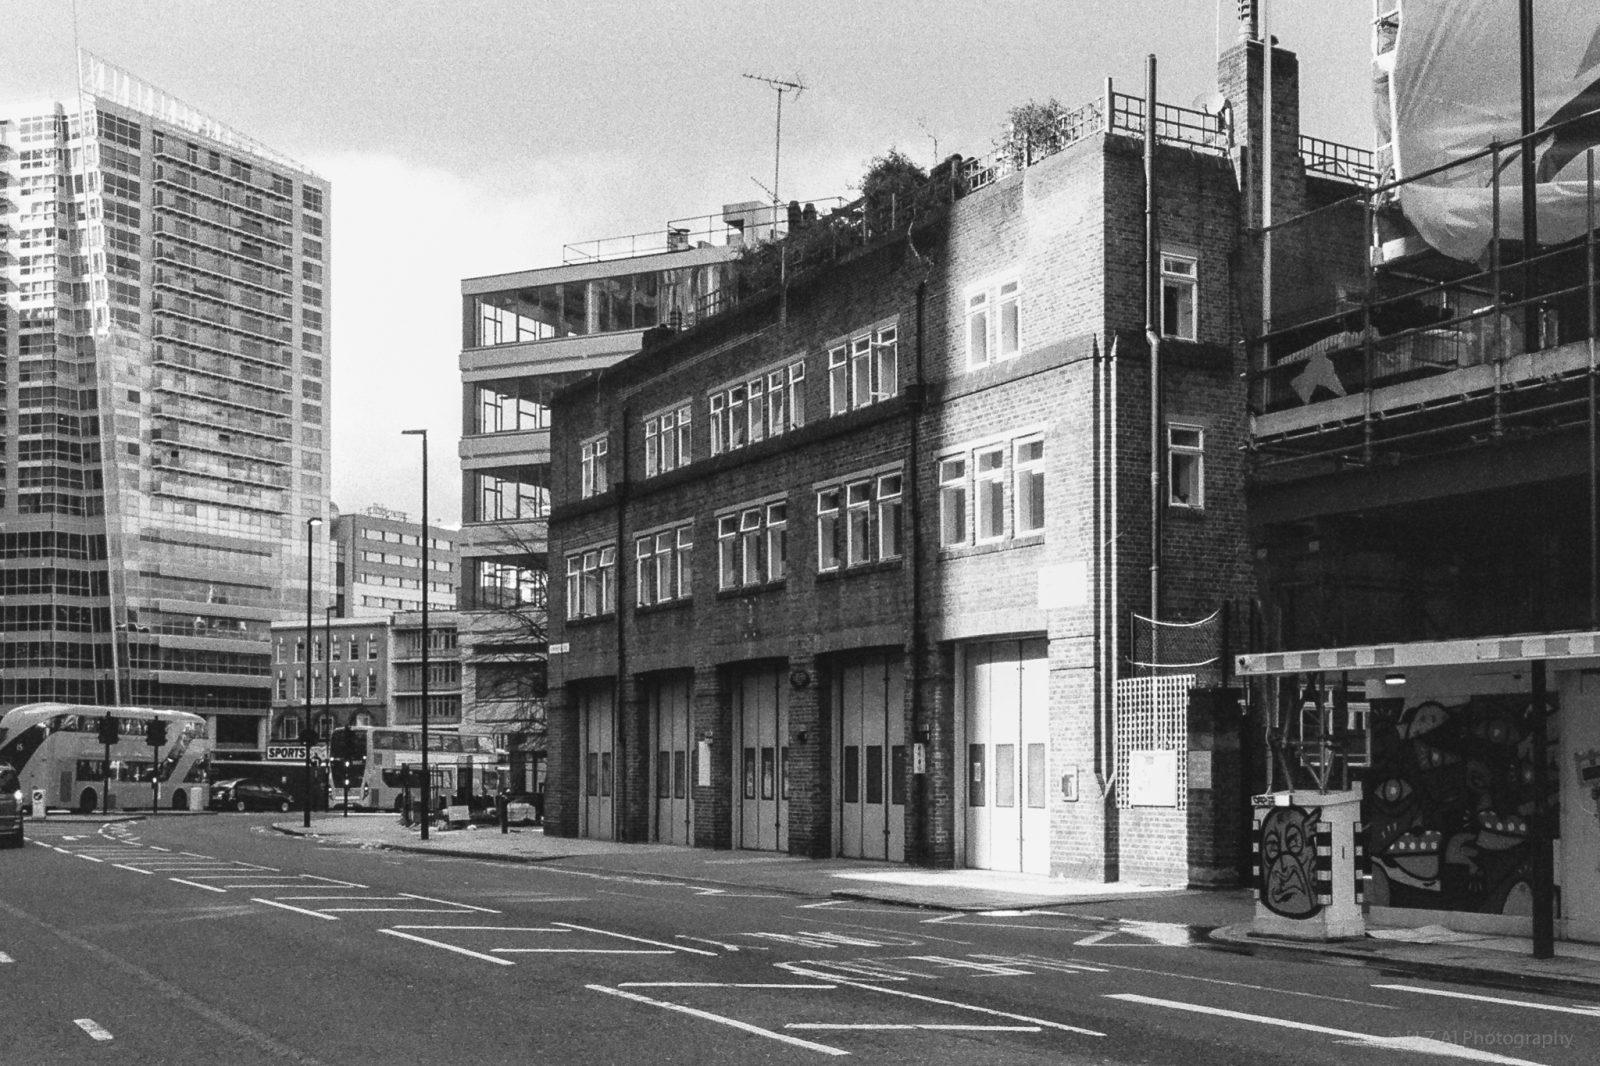 Whitechapel Fire Station